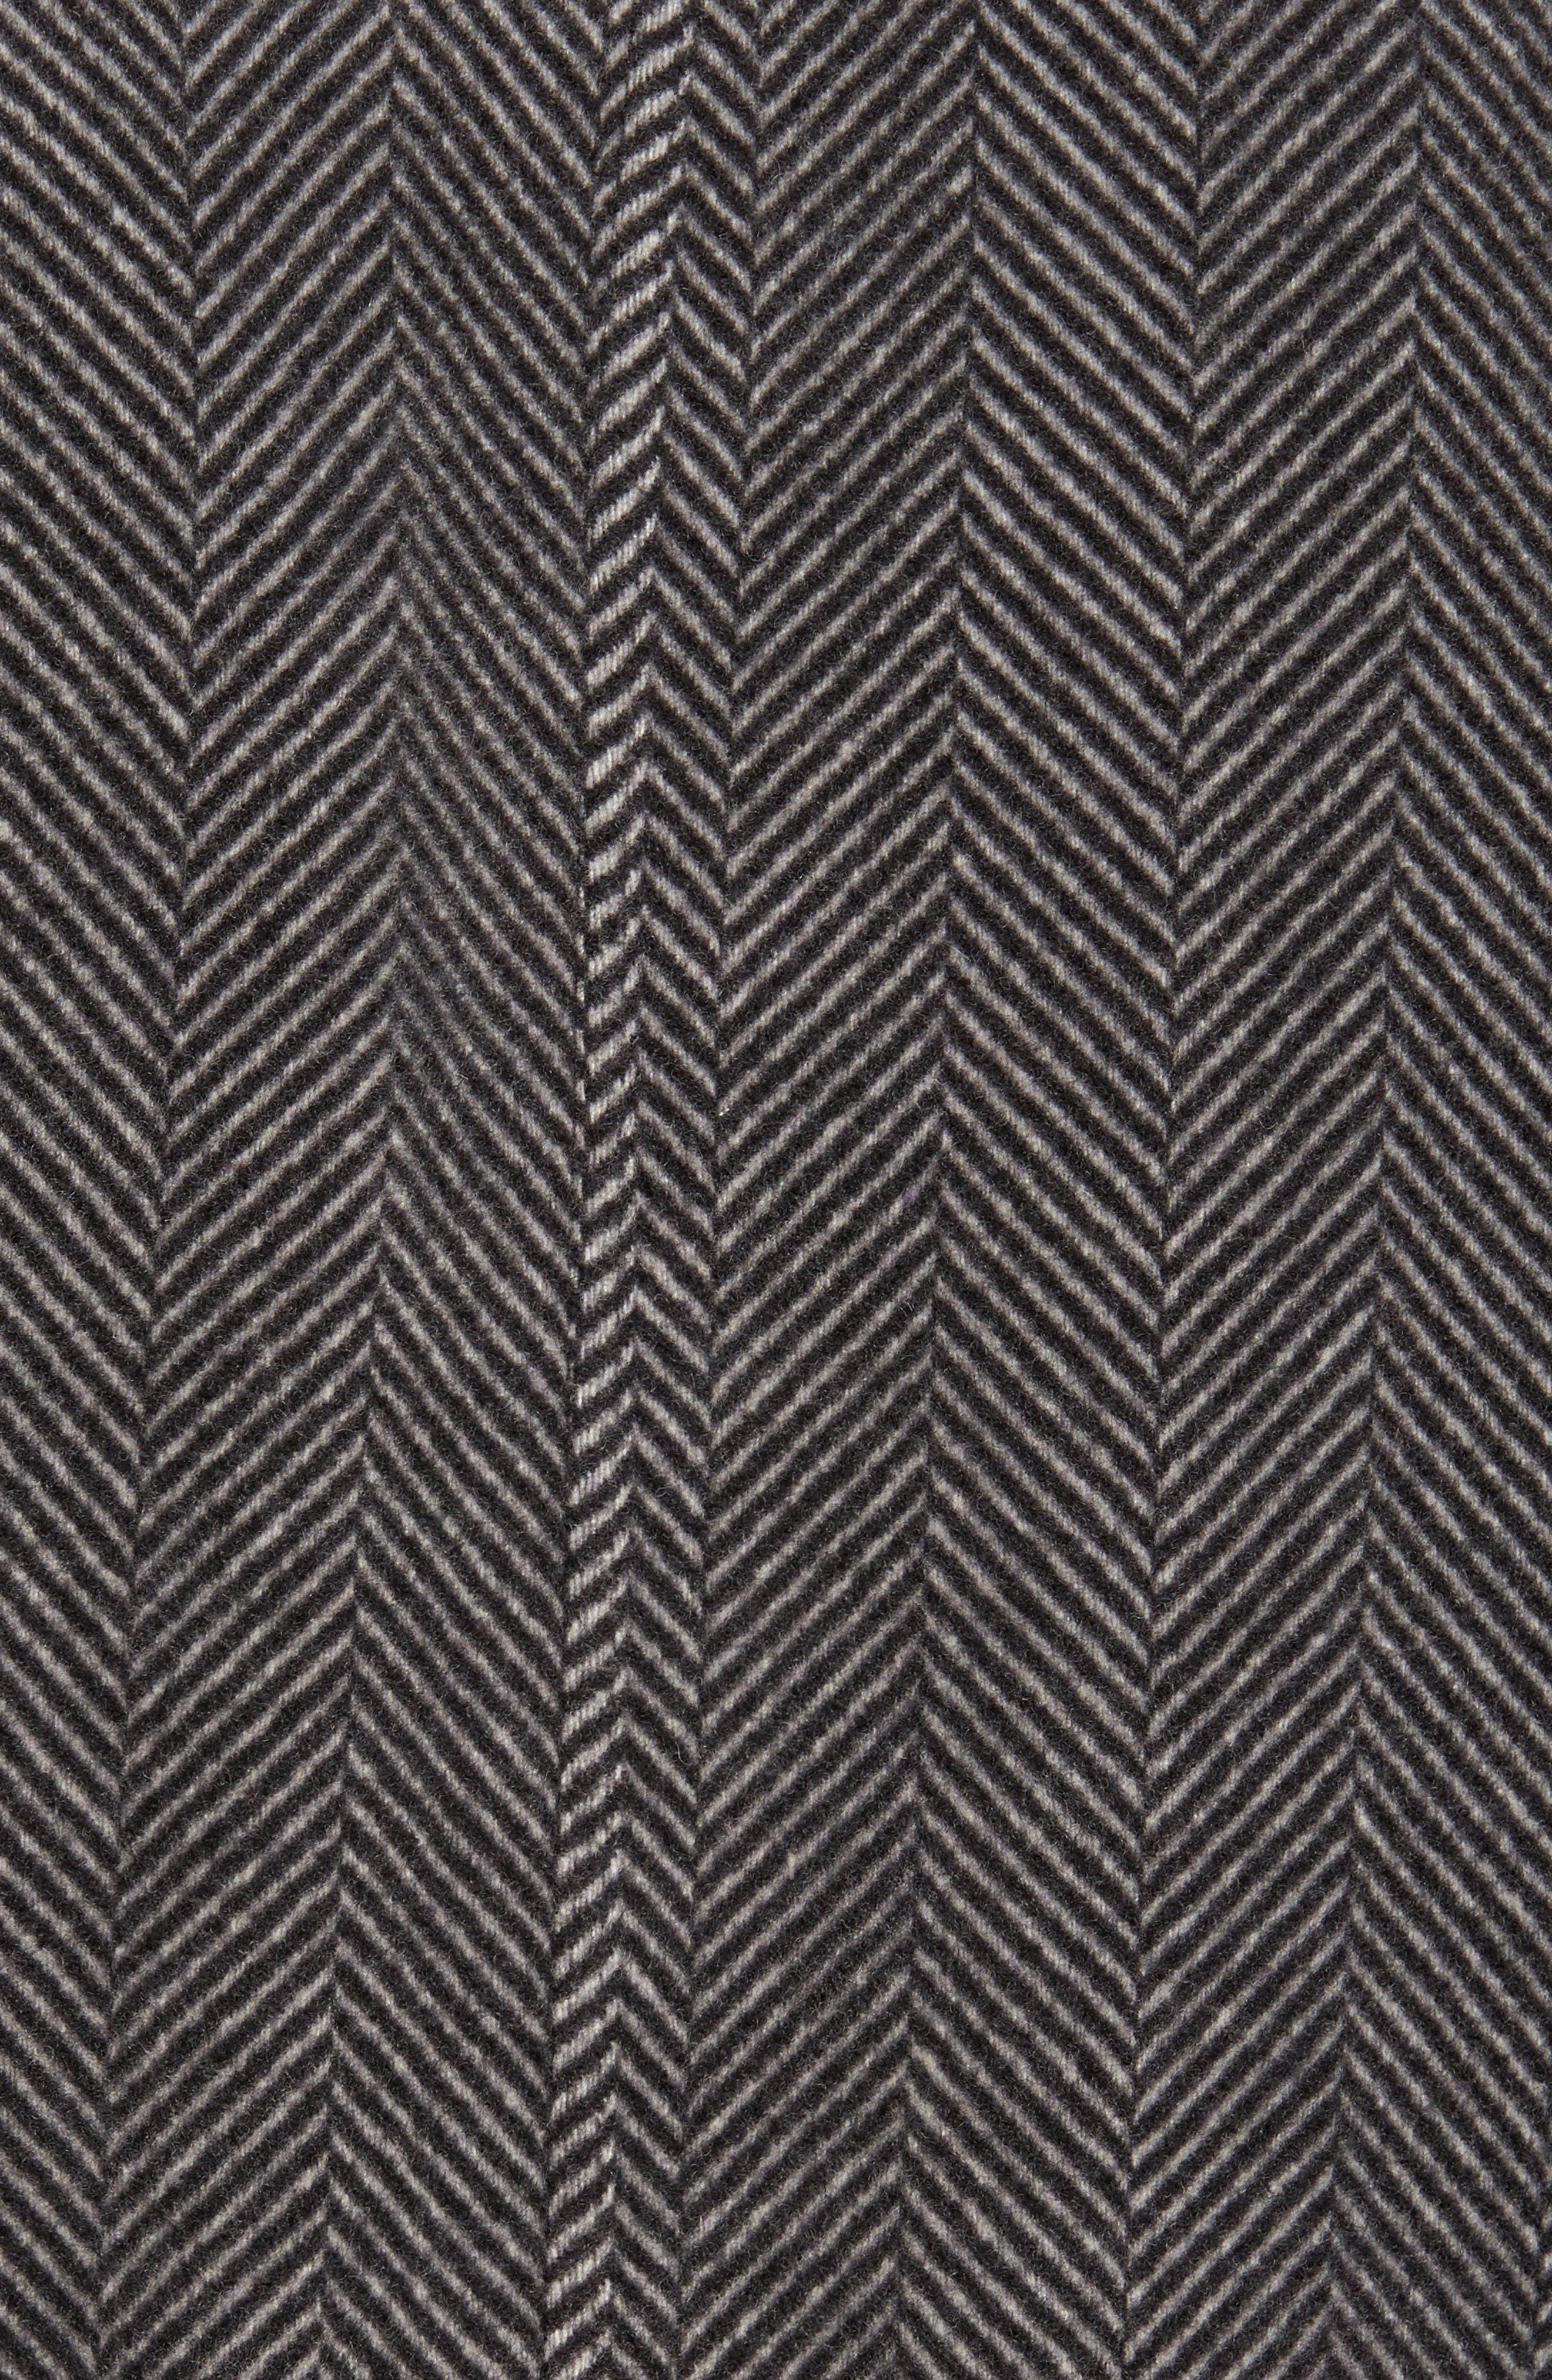 Anchor Line Herringbone Wool Blend Shirt Jacket,                             Alternate thumbnail 5, color,                             Charcoal Heather